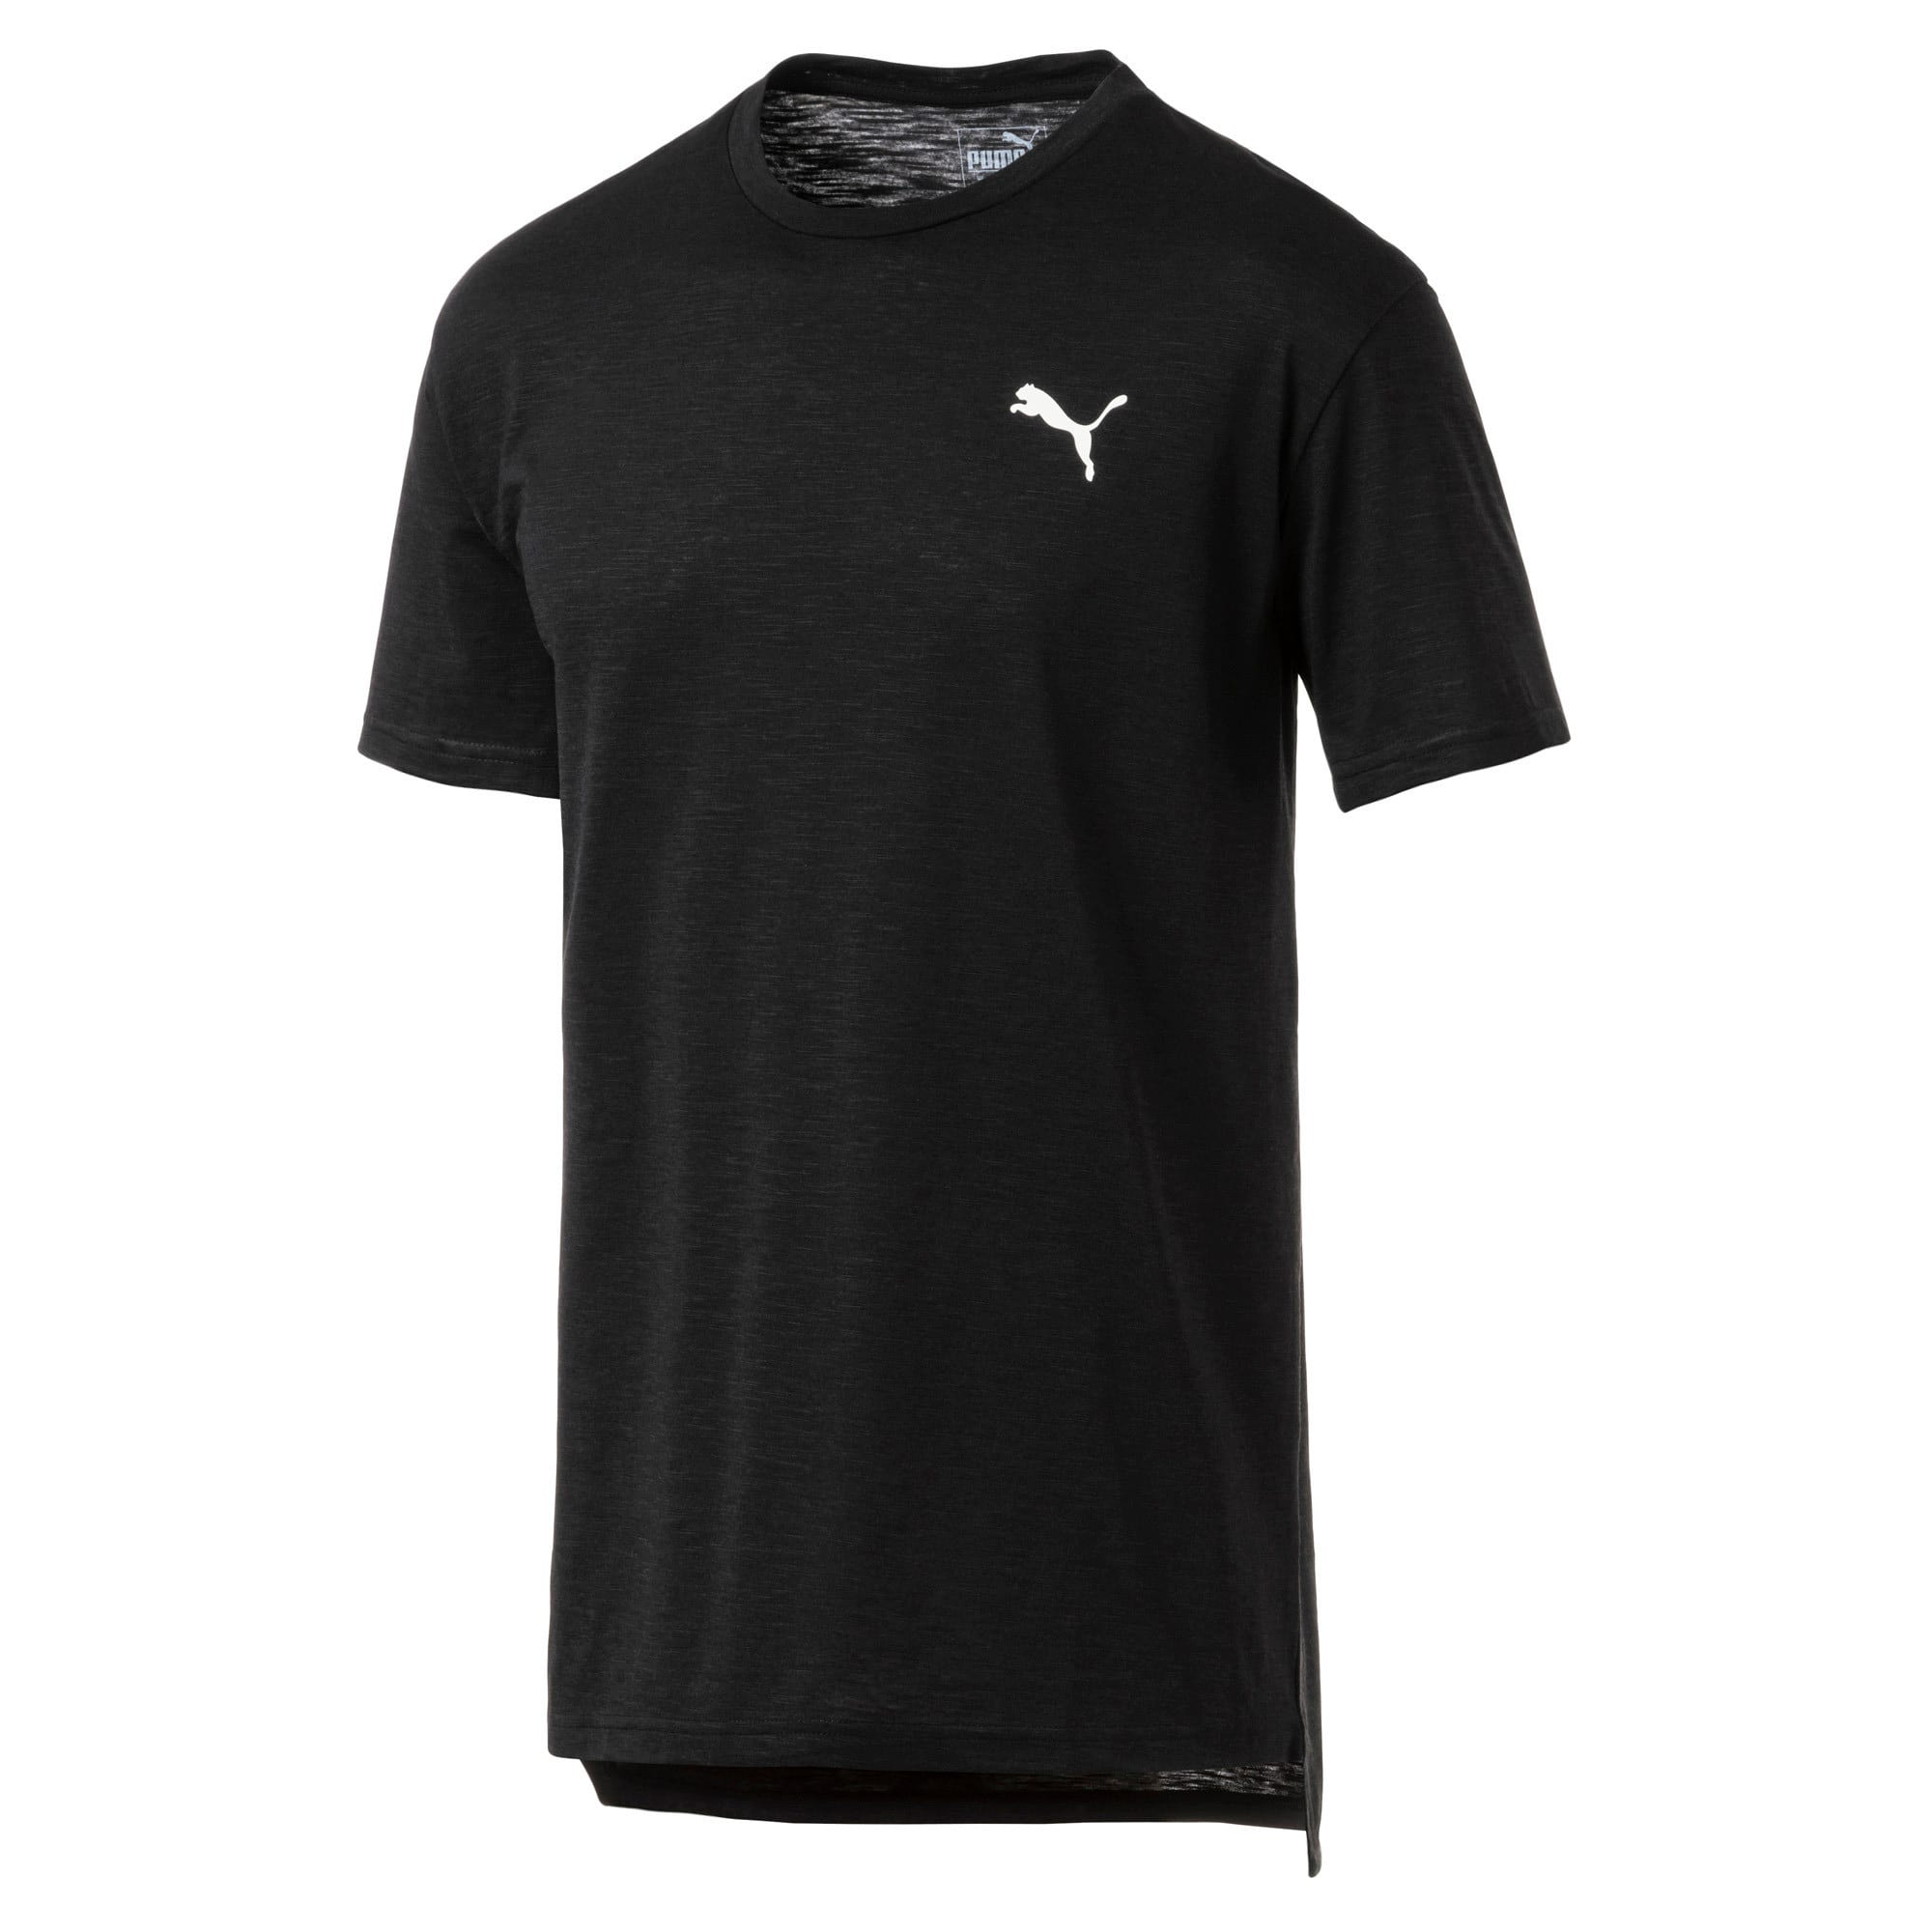 Thumbnail 4 of Energy Herren Training T-Shirt, Puma Black Heather, medium